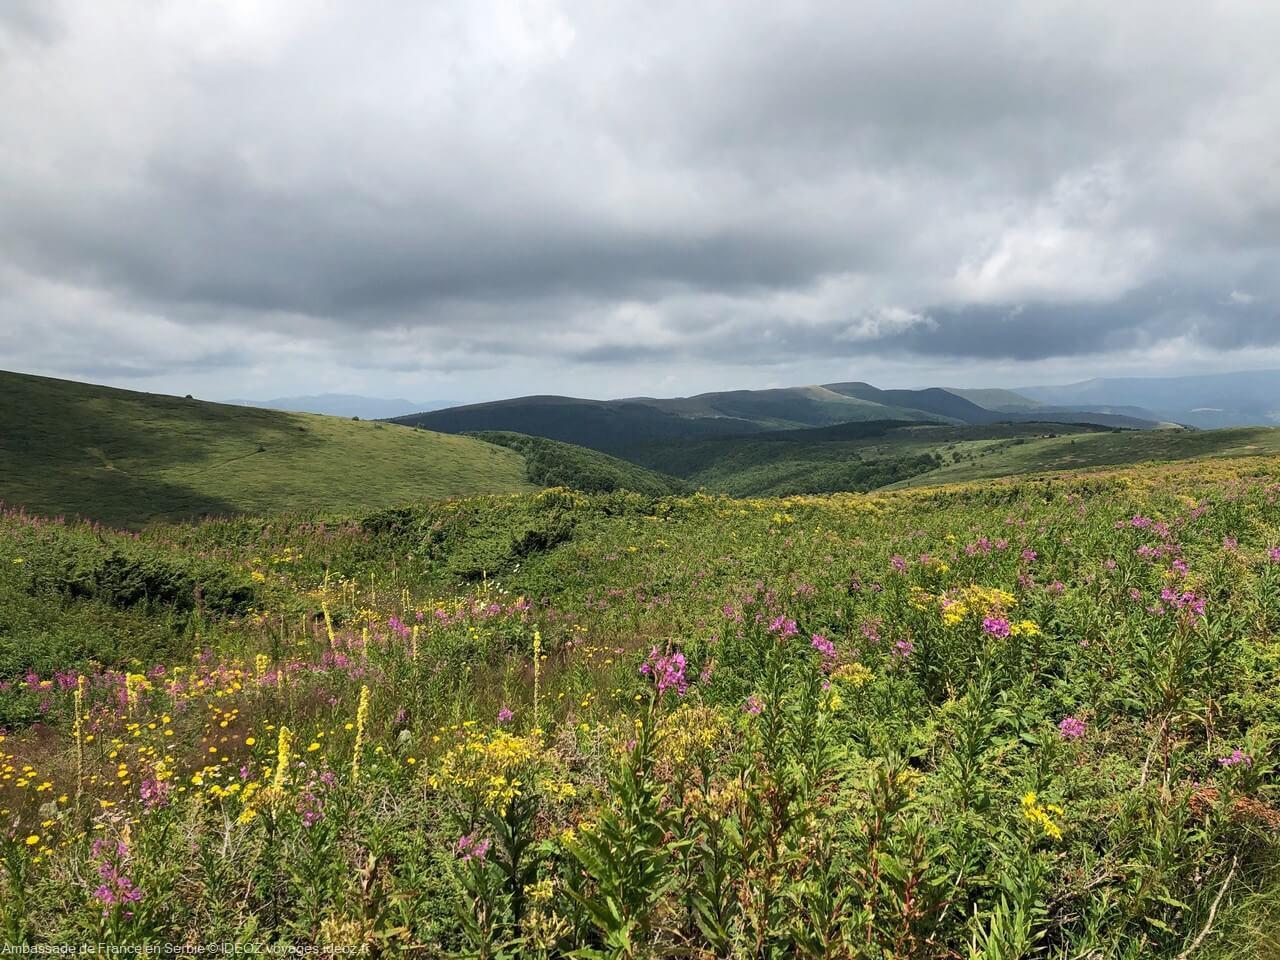 Randonnée à Stara Planina, sur la via dinarica voie verte en Serbie 1